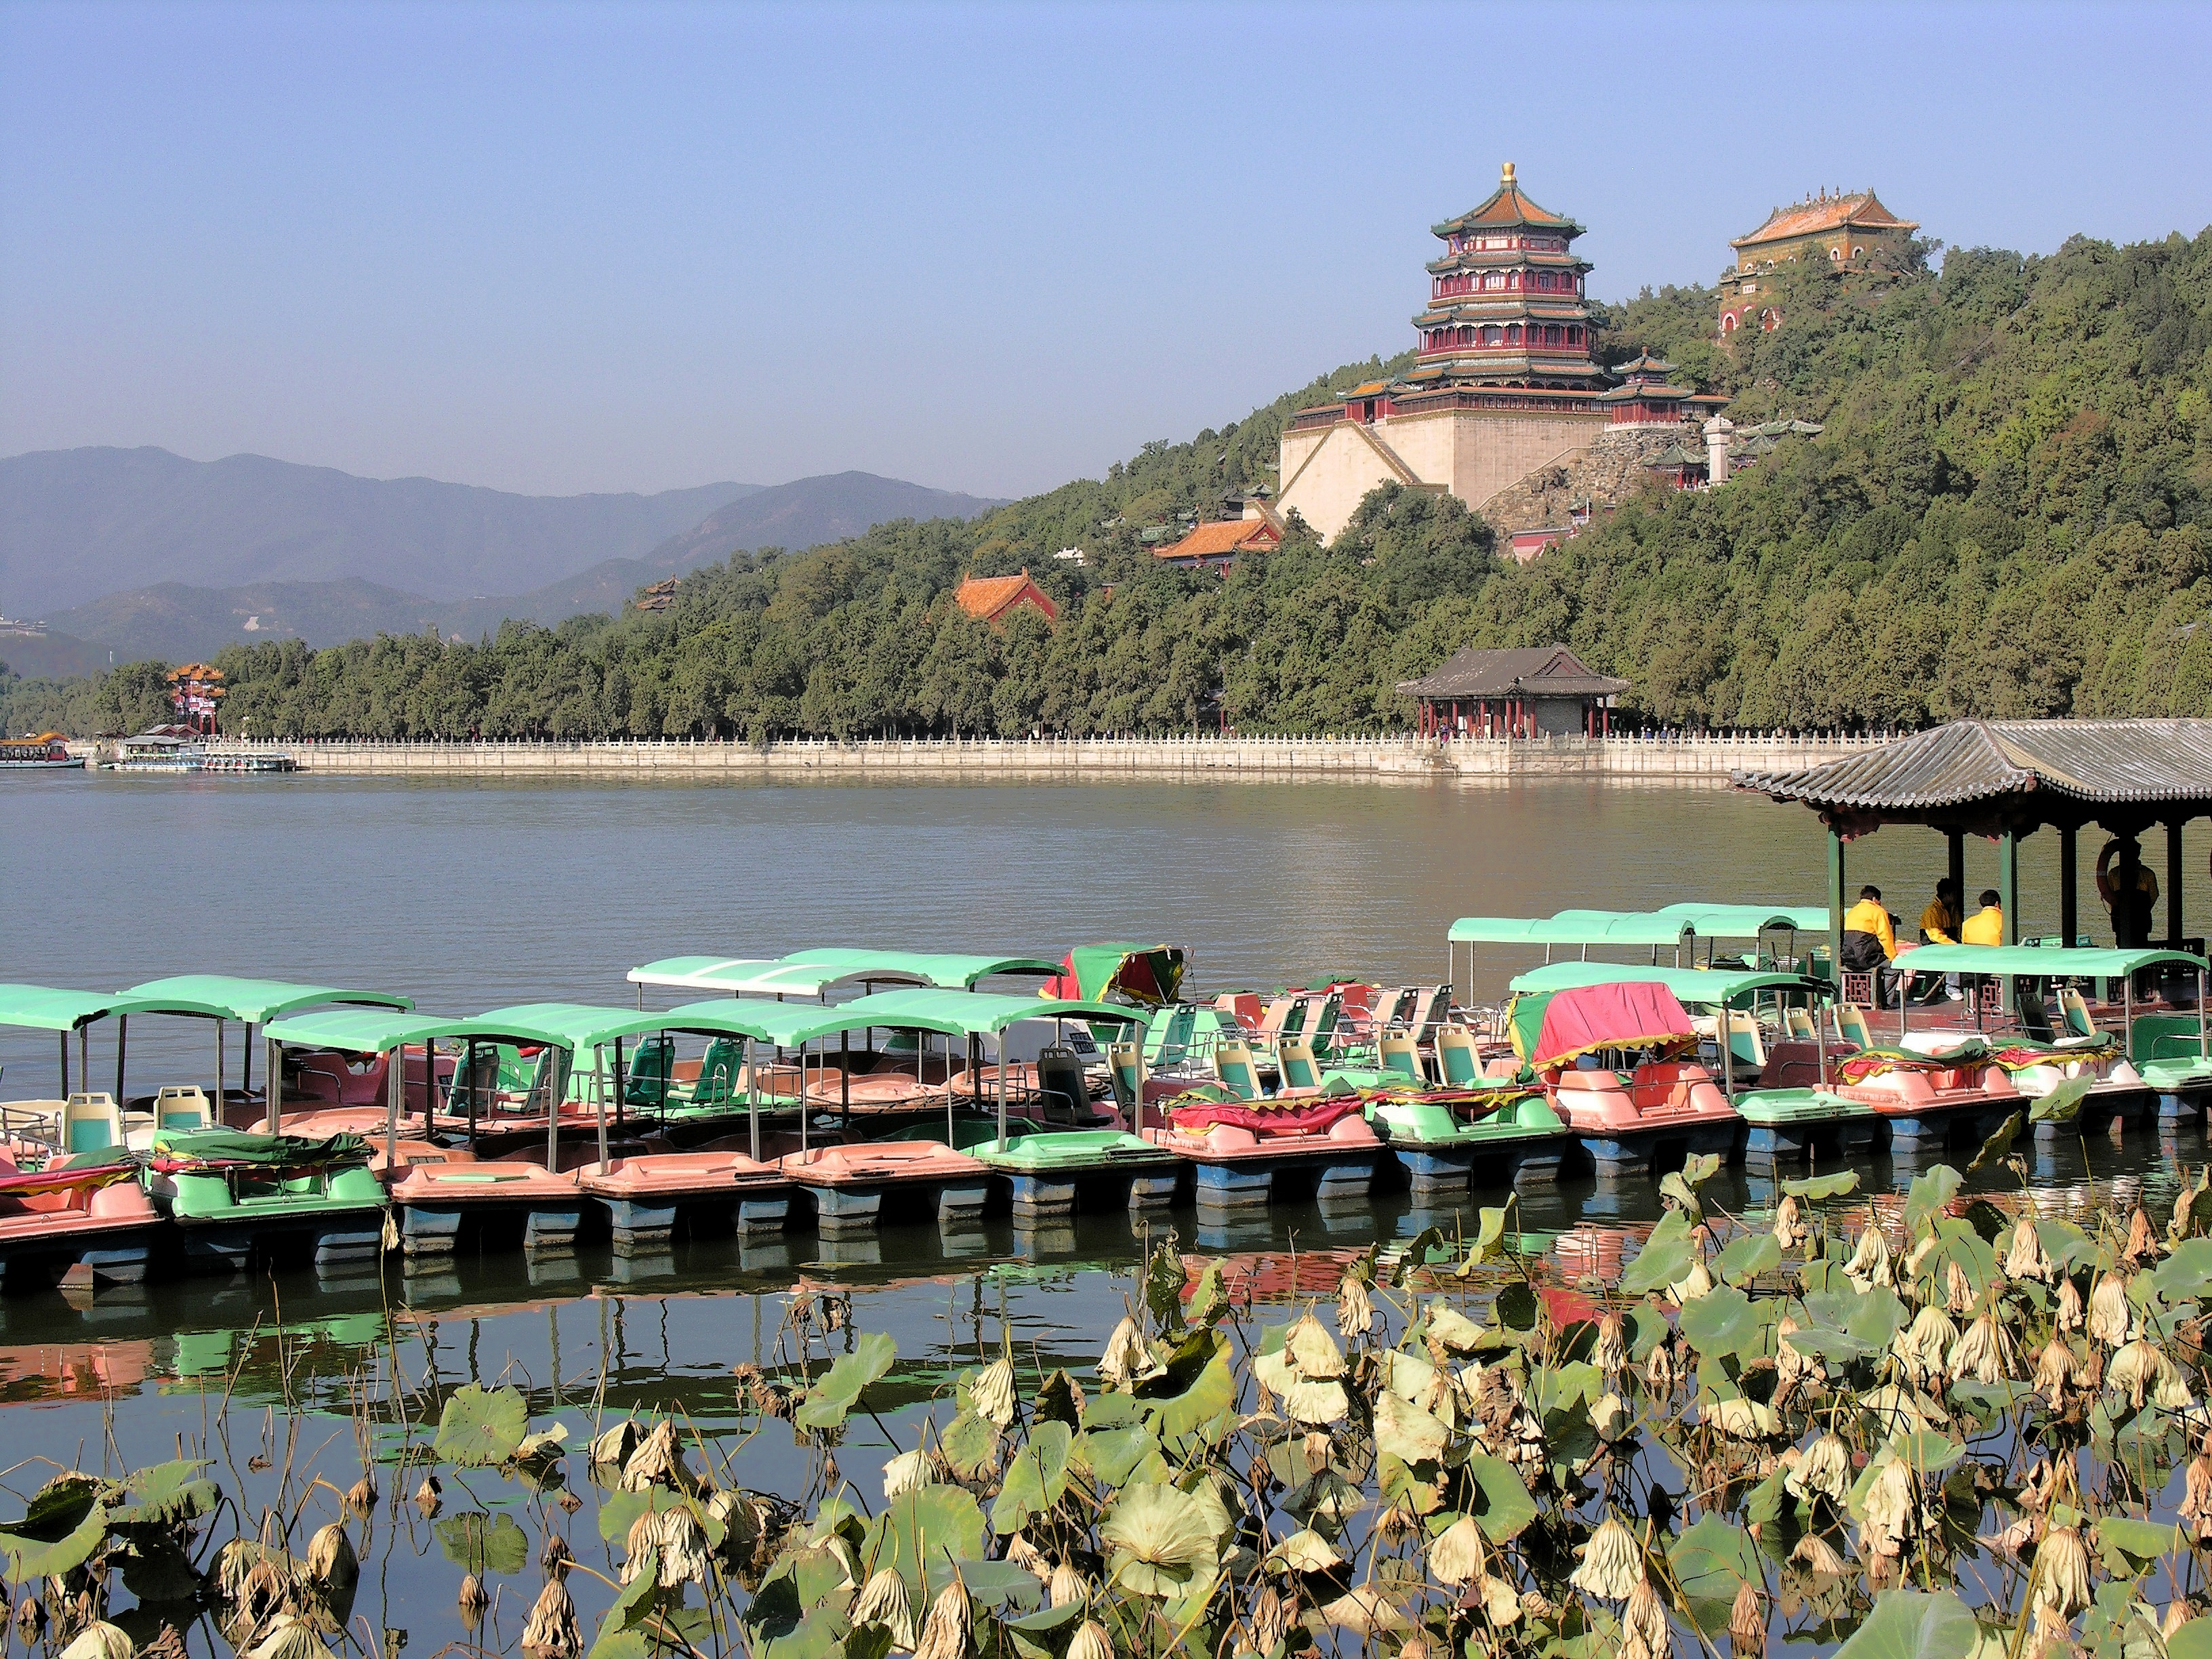 Sommerpalast Peking Kartta Android Inawenines Cf